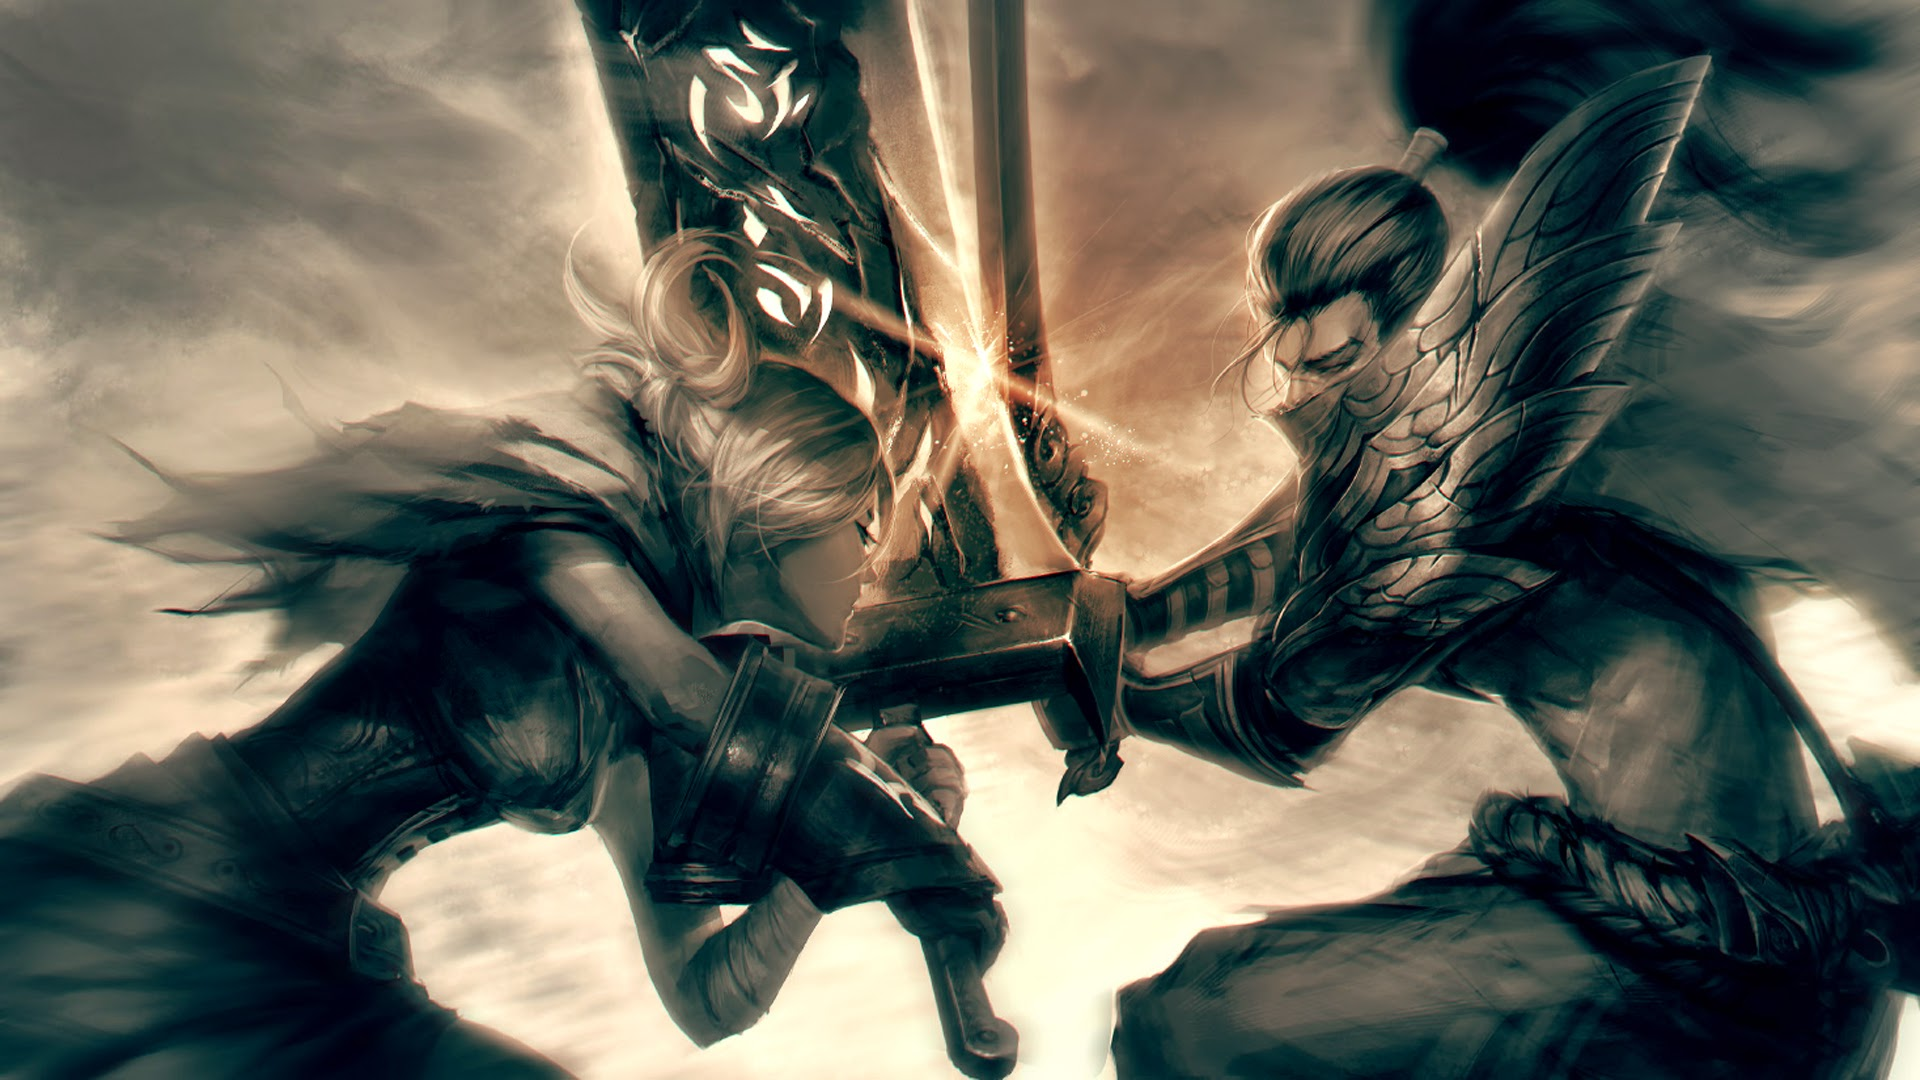 riven vs yasuo clash fighting league of legends hd wallpaper lol ...